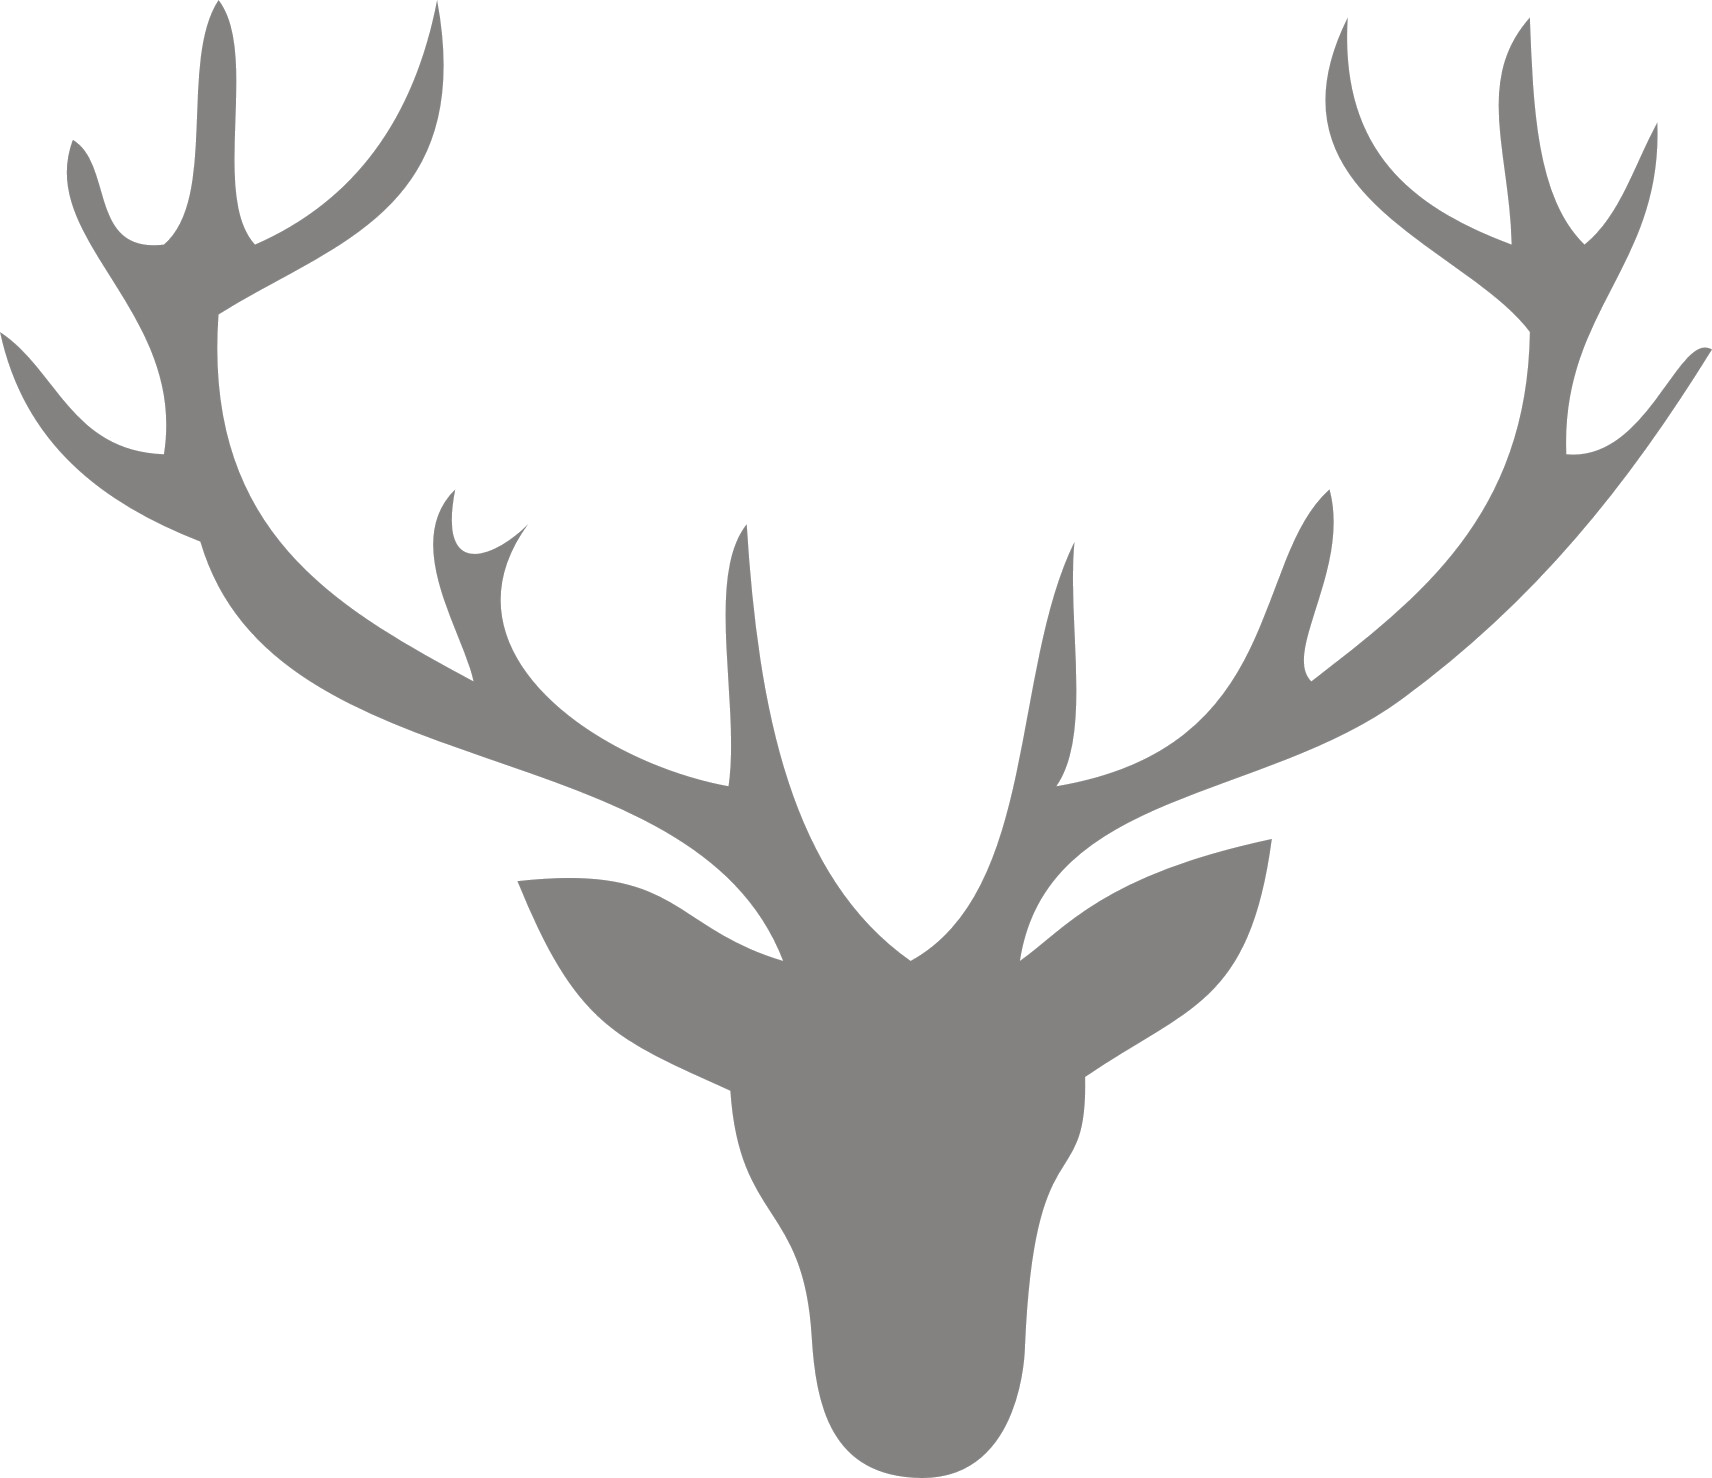 Reindeer antler clip art. Antlers clipart profile